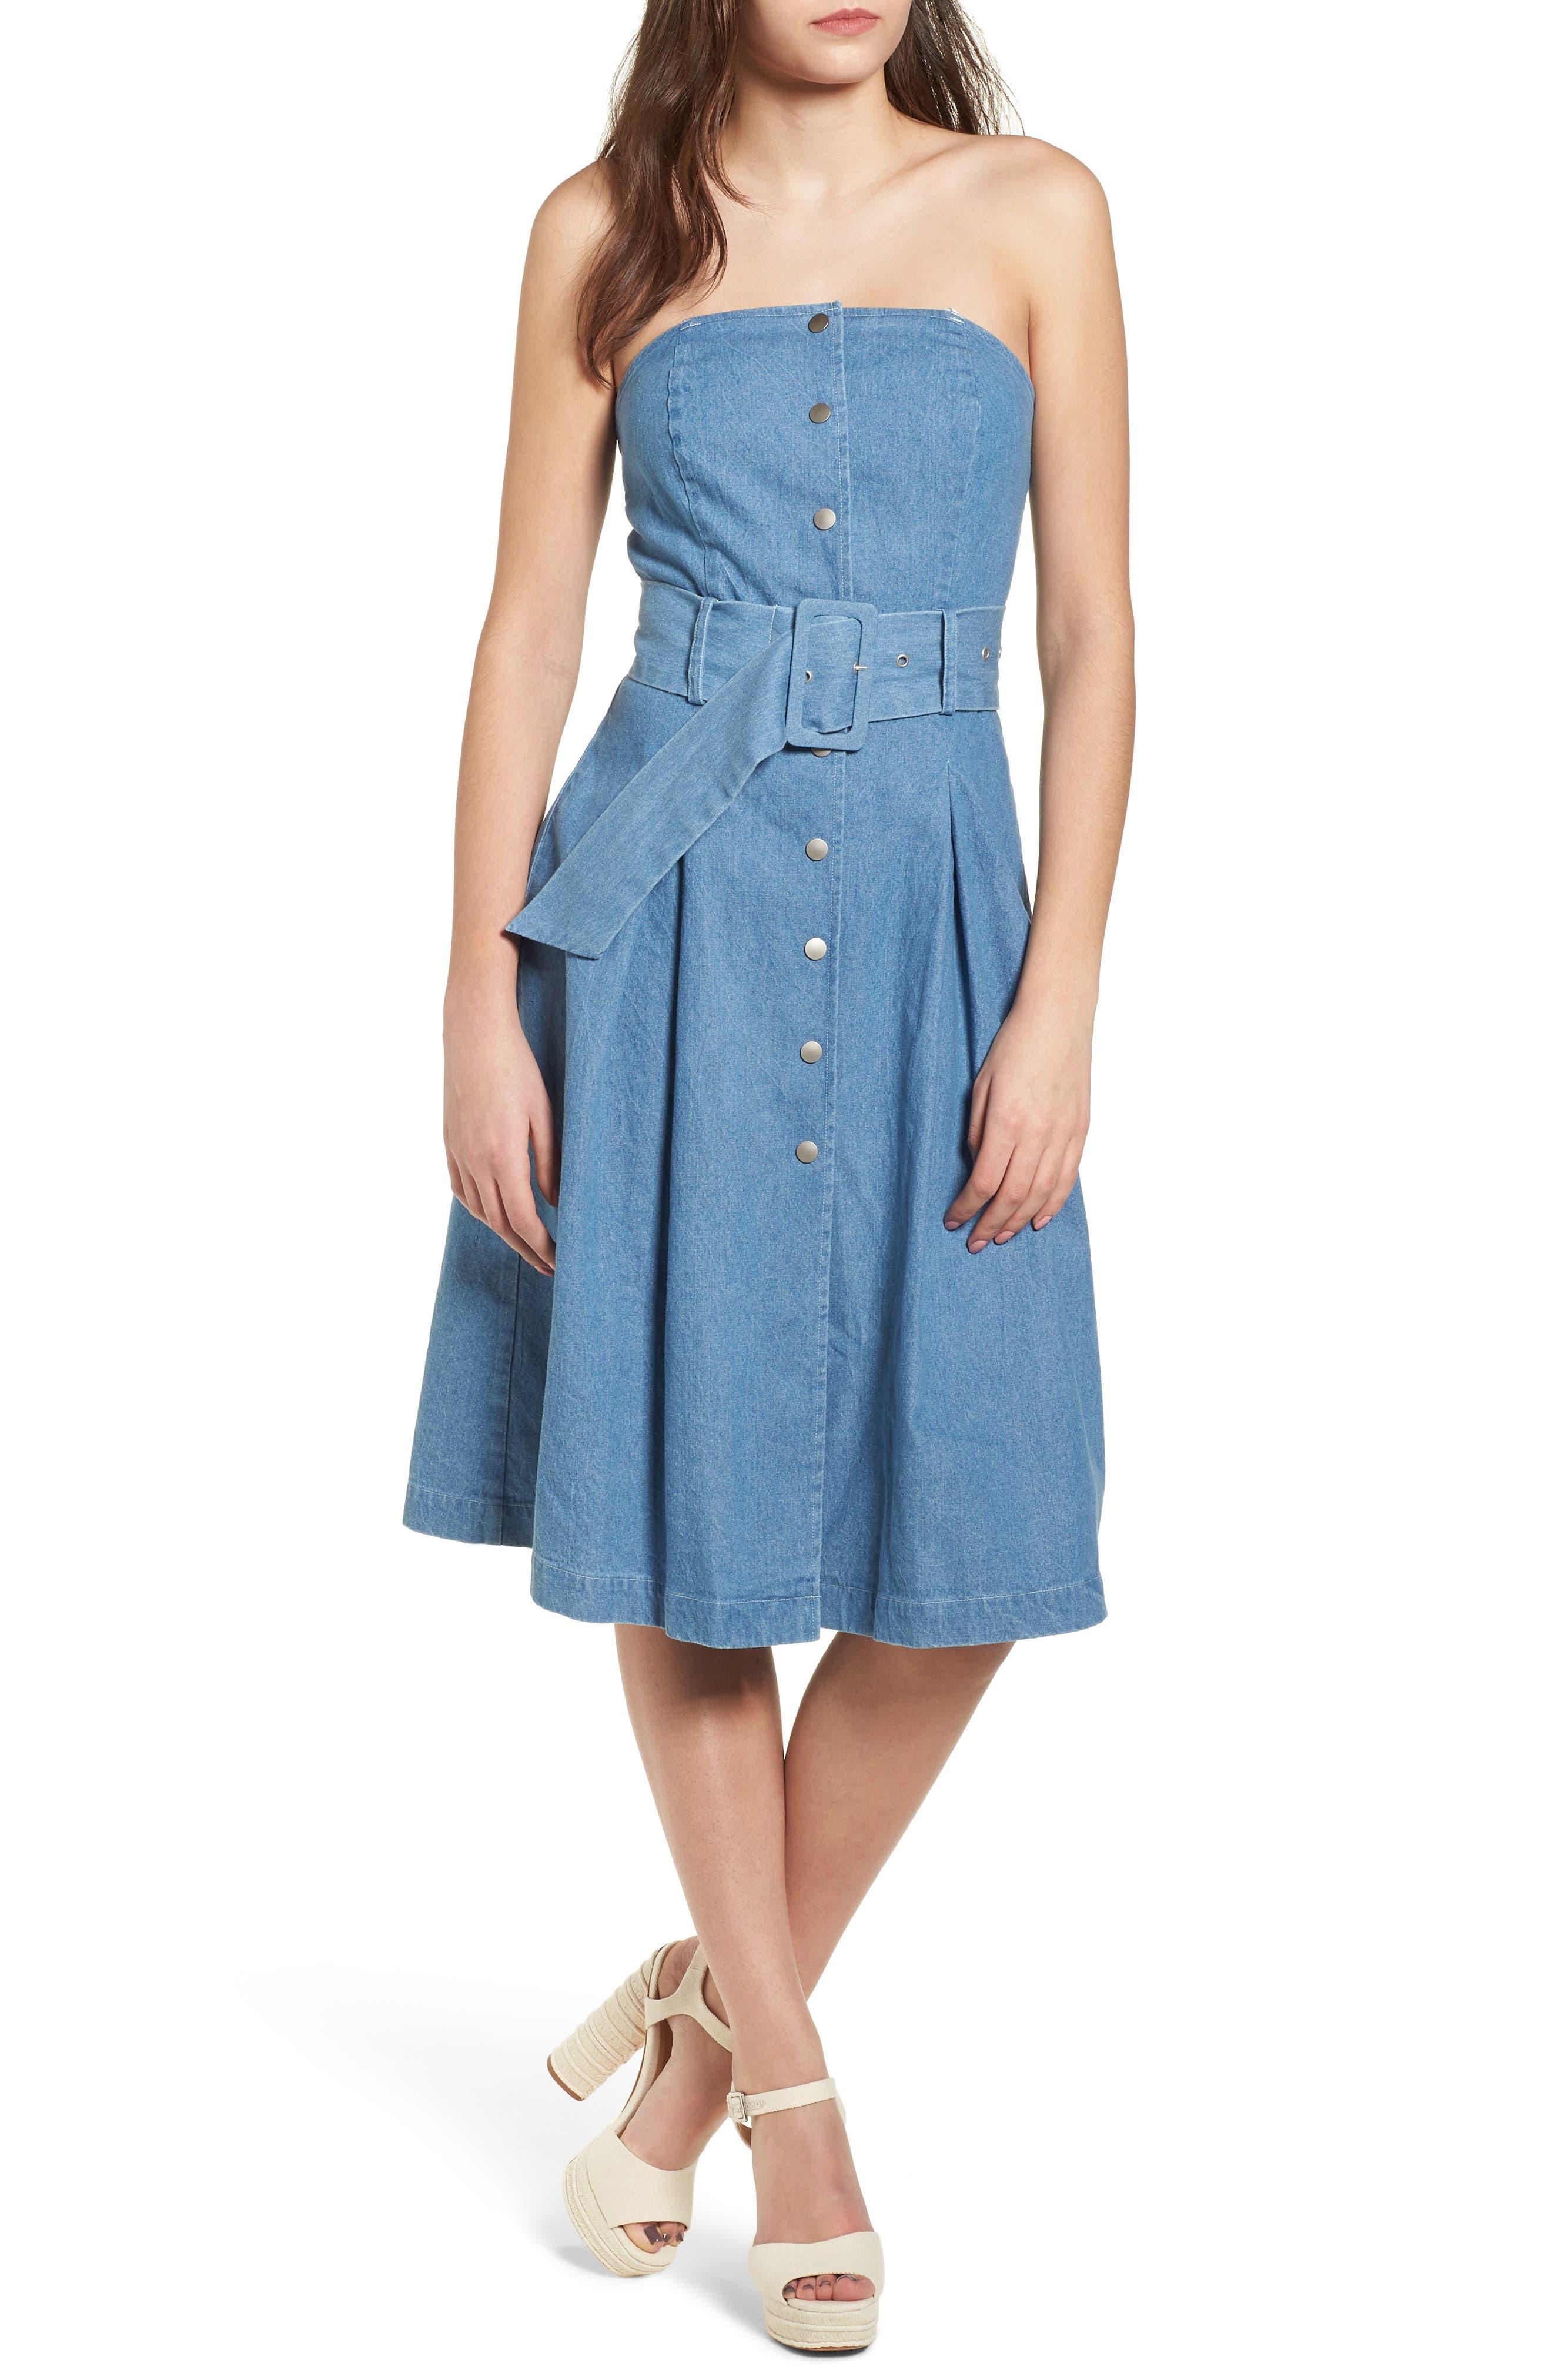 J.O.A. Strapless Denim Dress